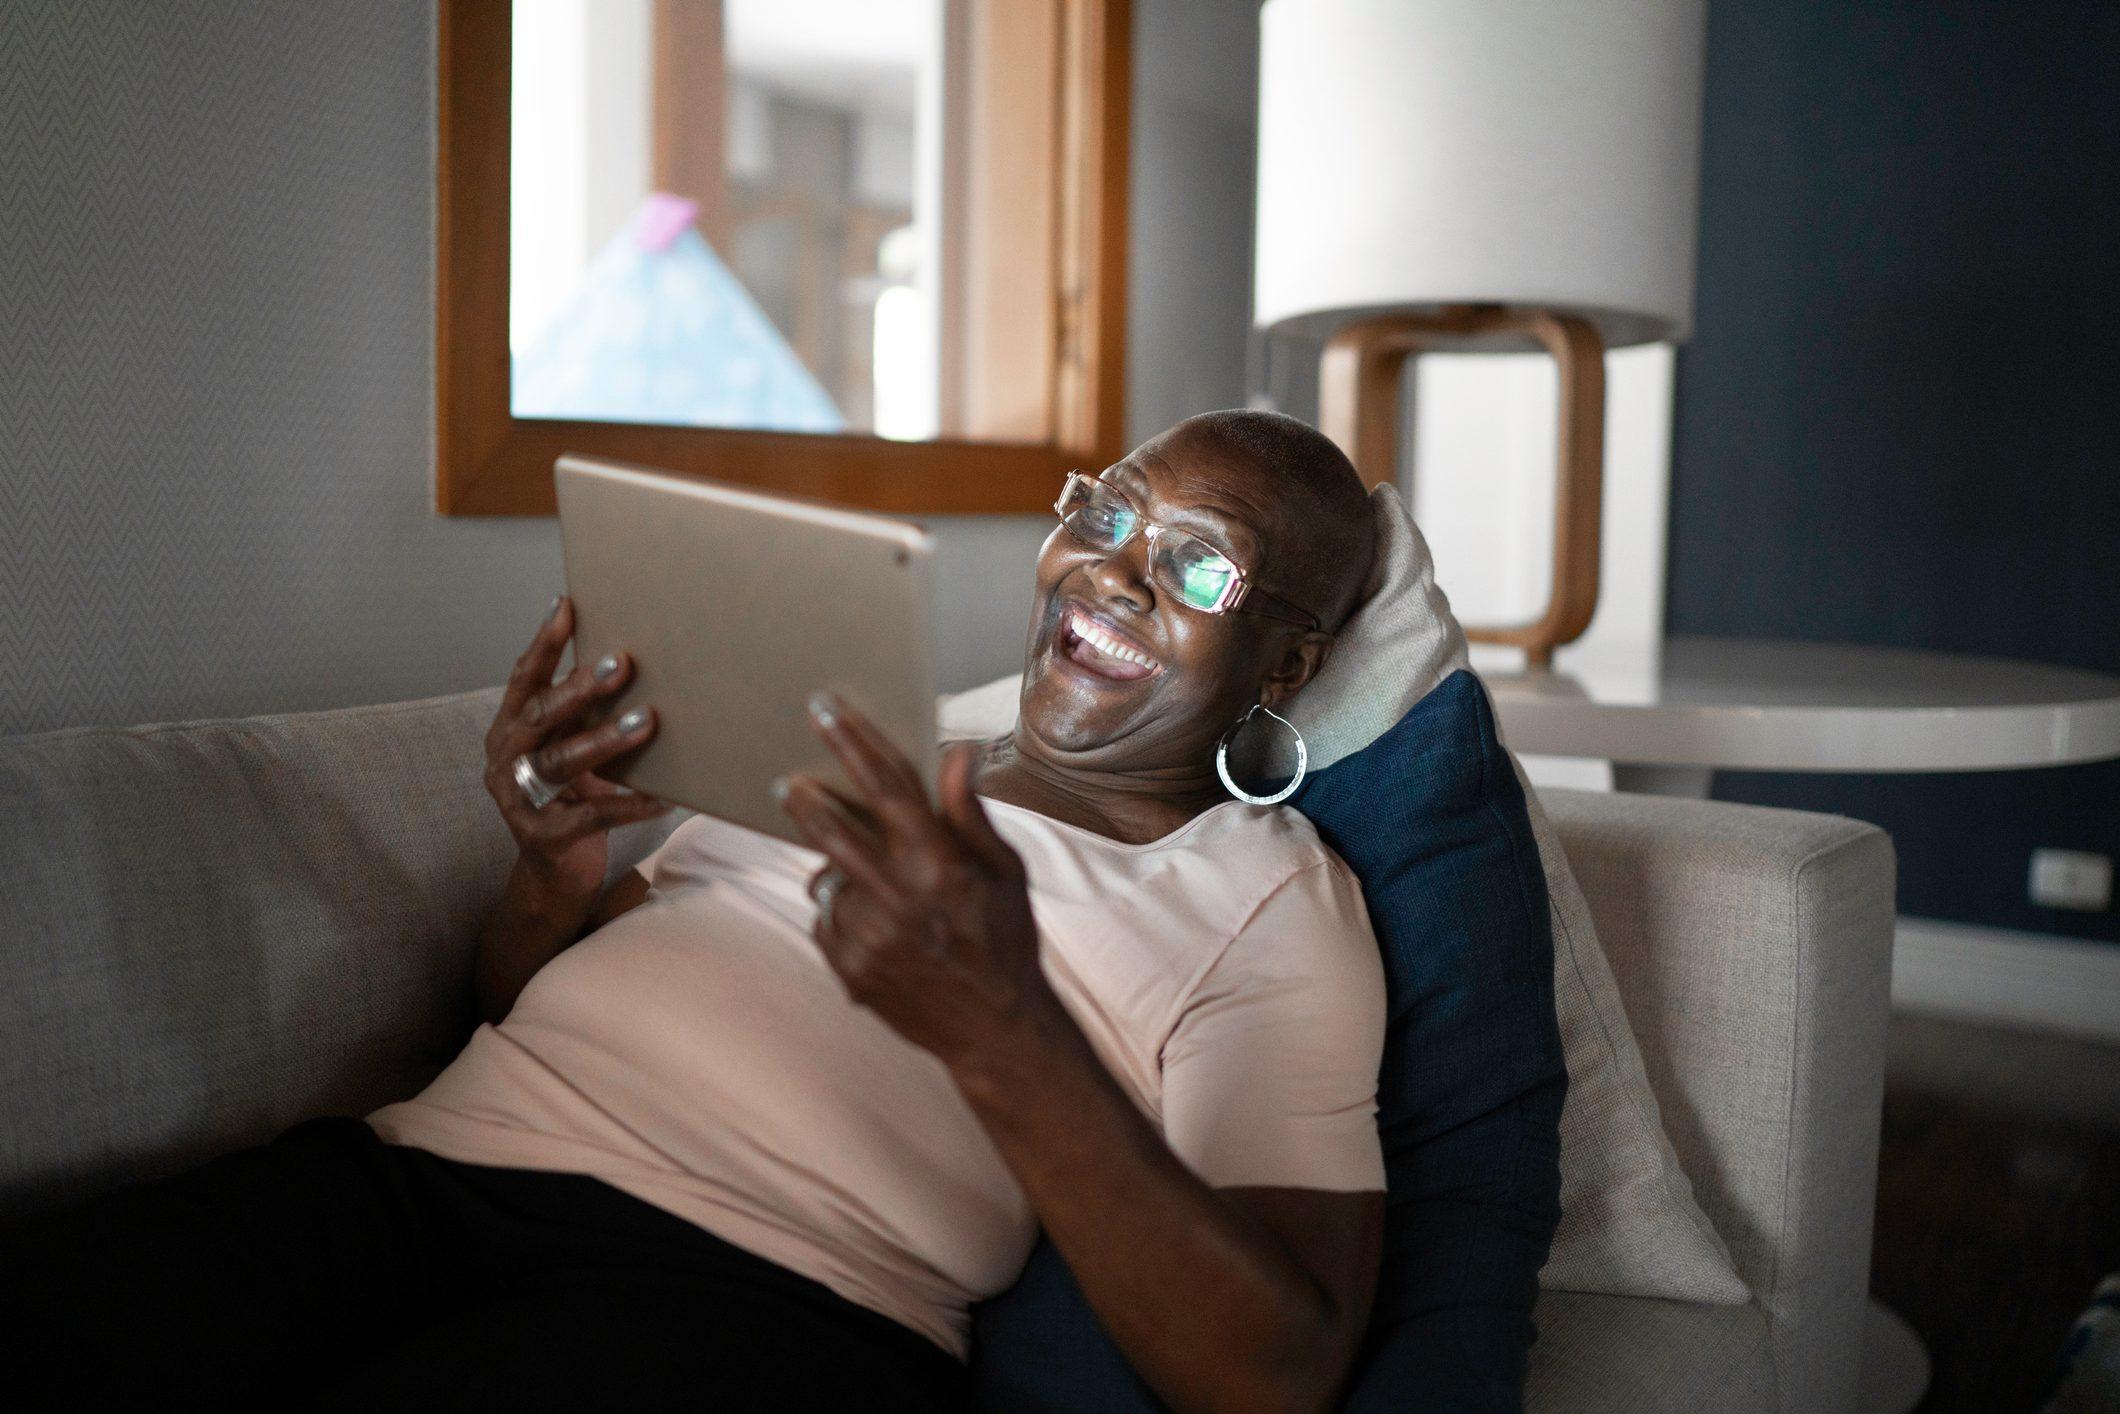 Senior woman lying down on sofa using tablet